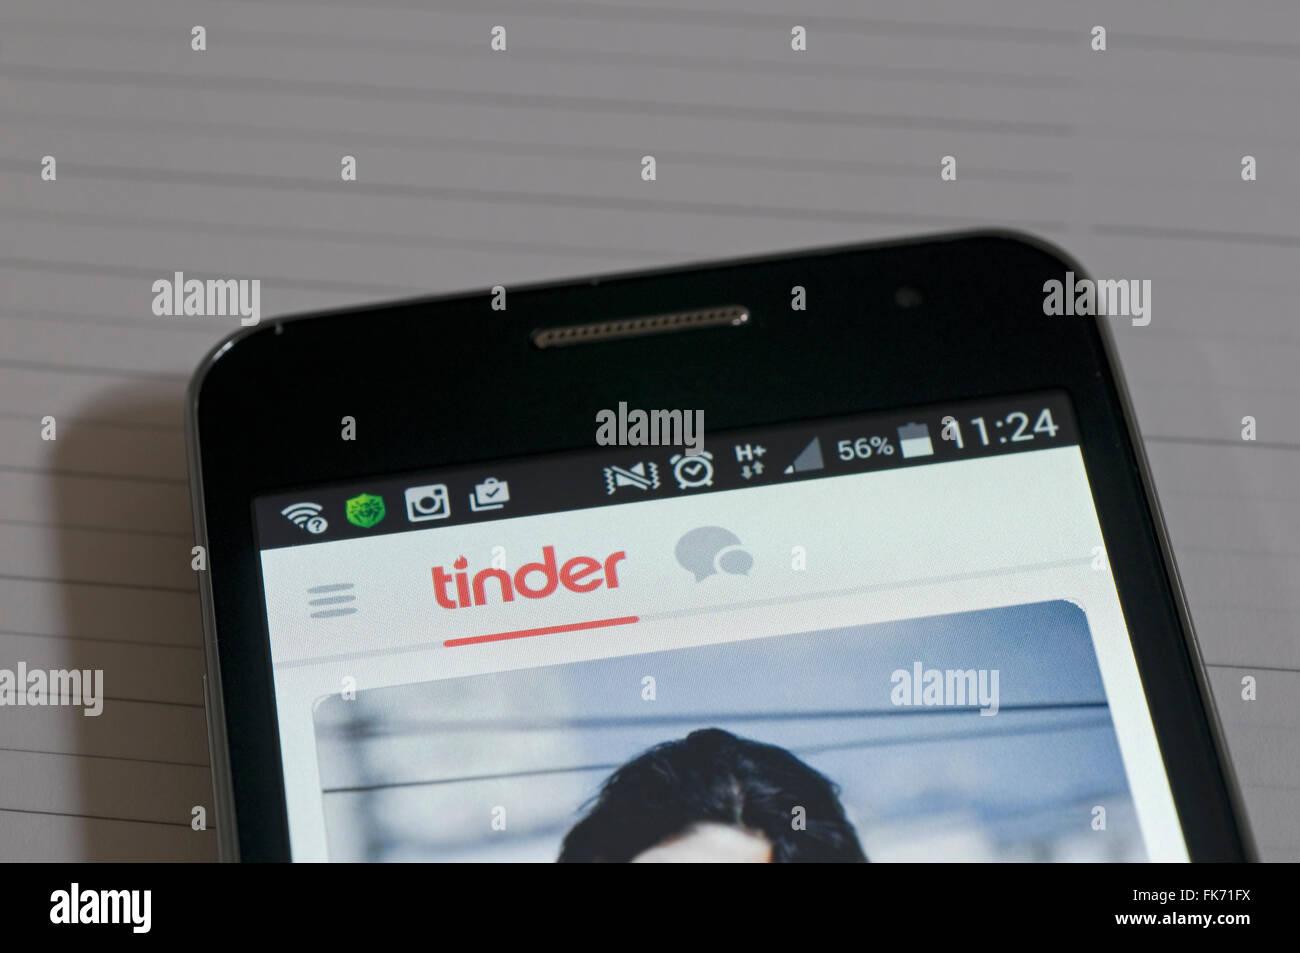 Tinder dating app sullo smartphone Immagini Stock